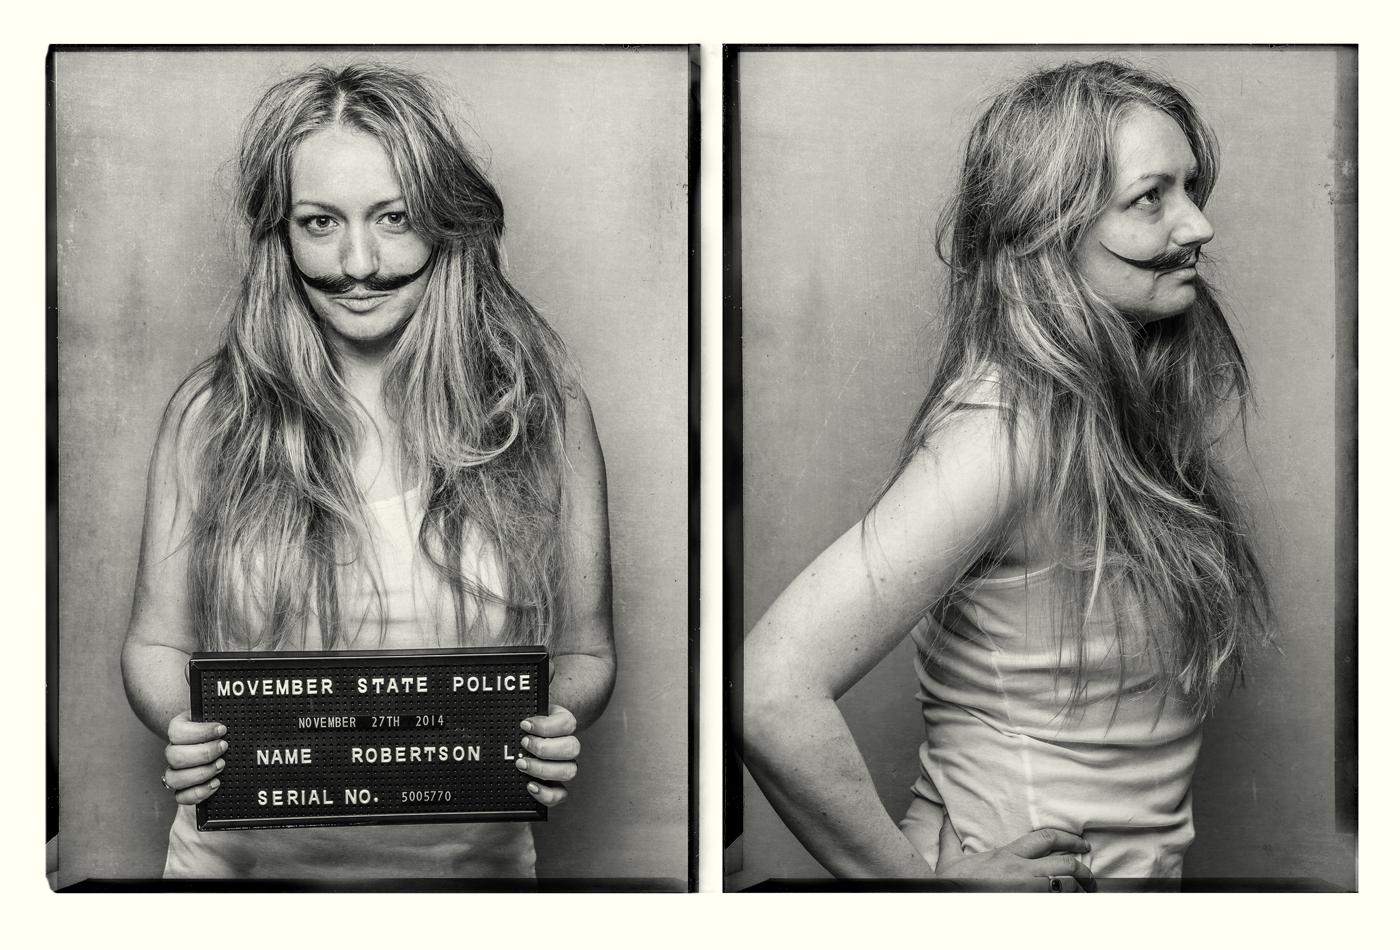 Movember-moustache-mugshots-BLUE5768a